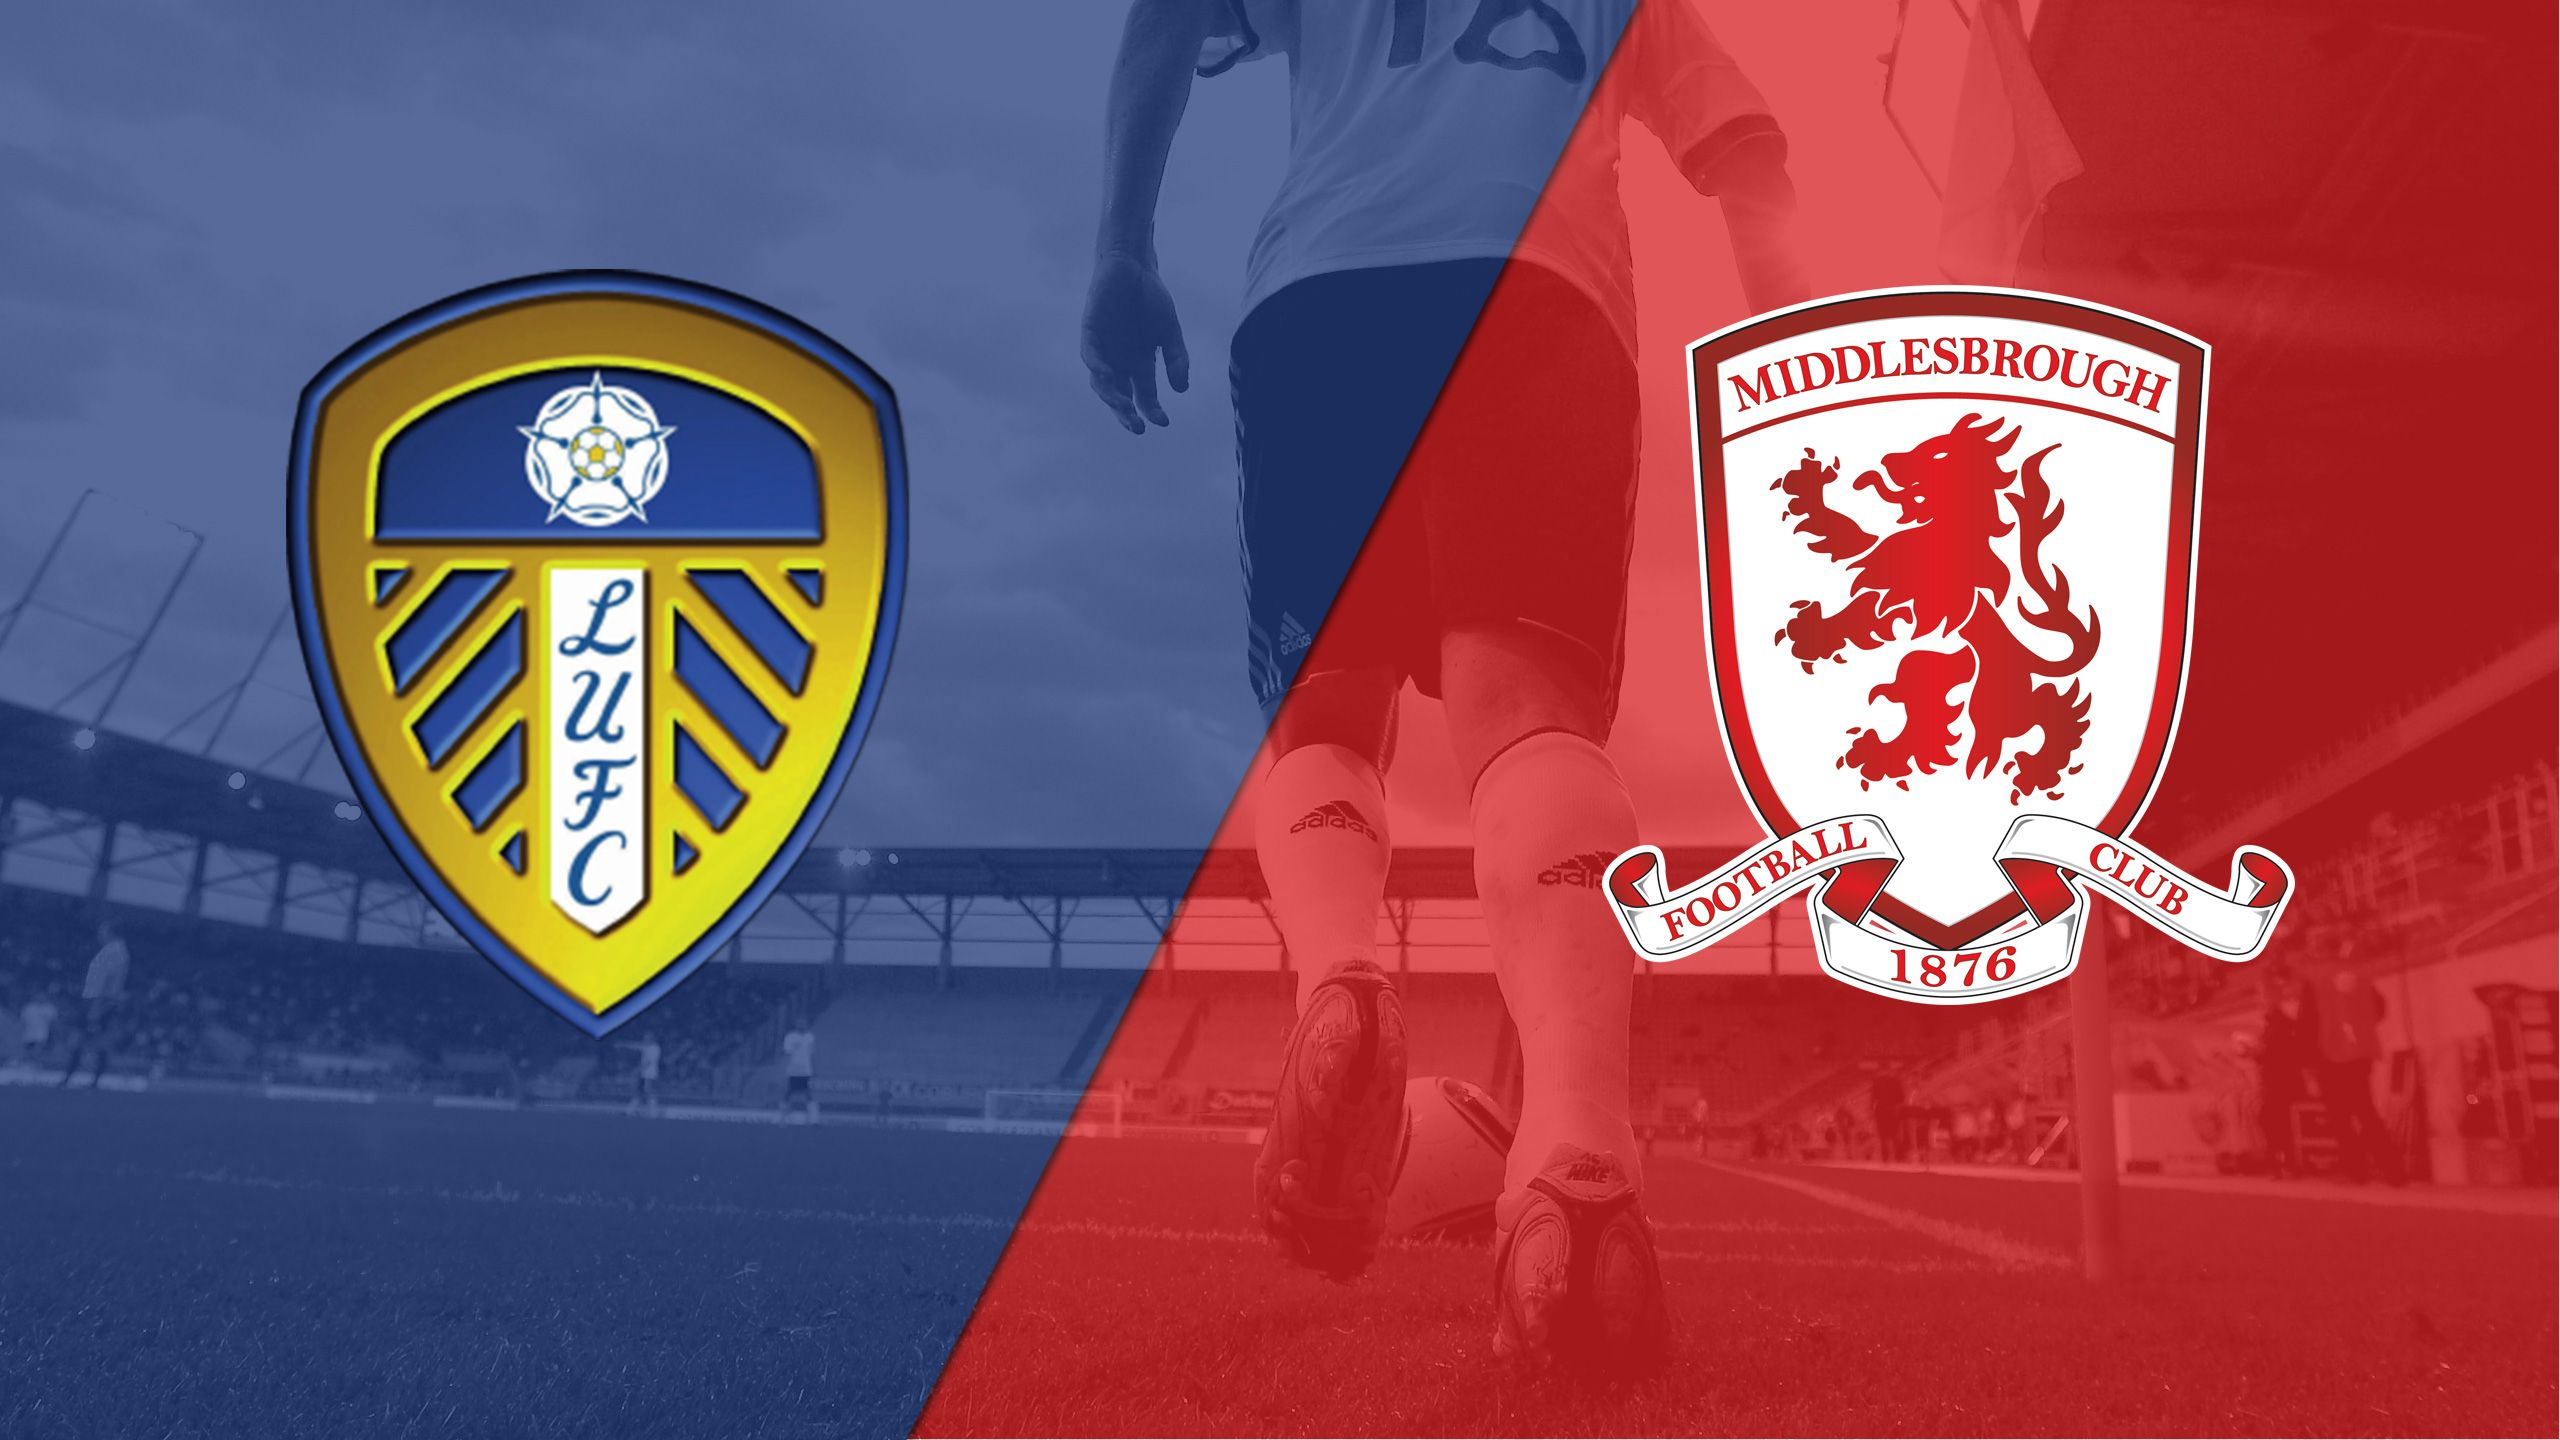 Leeds United vs. Middlesbrough (English League Championship)